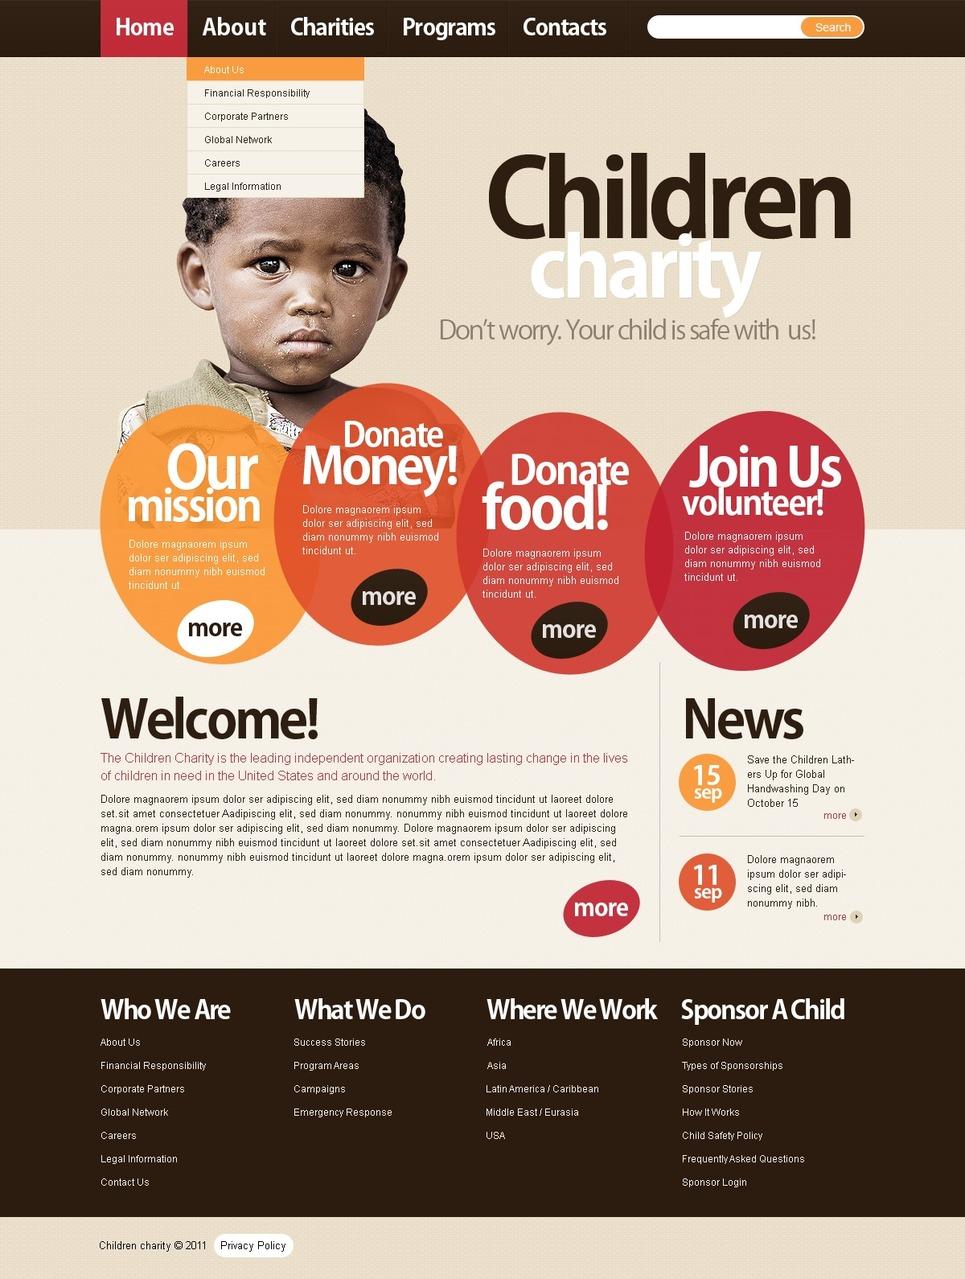 Child Charity Joomla Template New Screenshots BIG